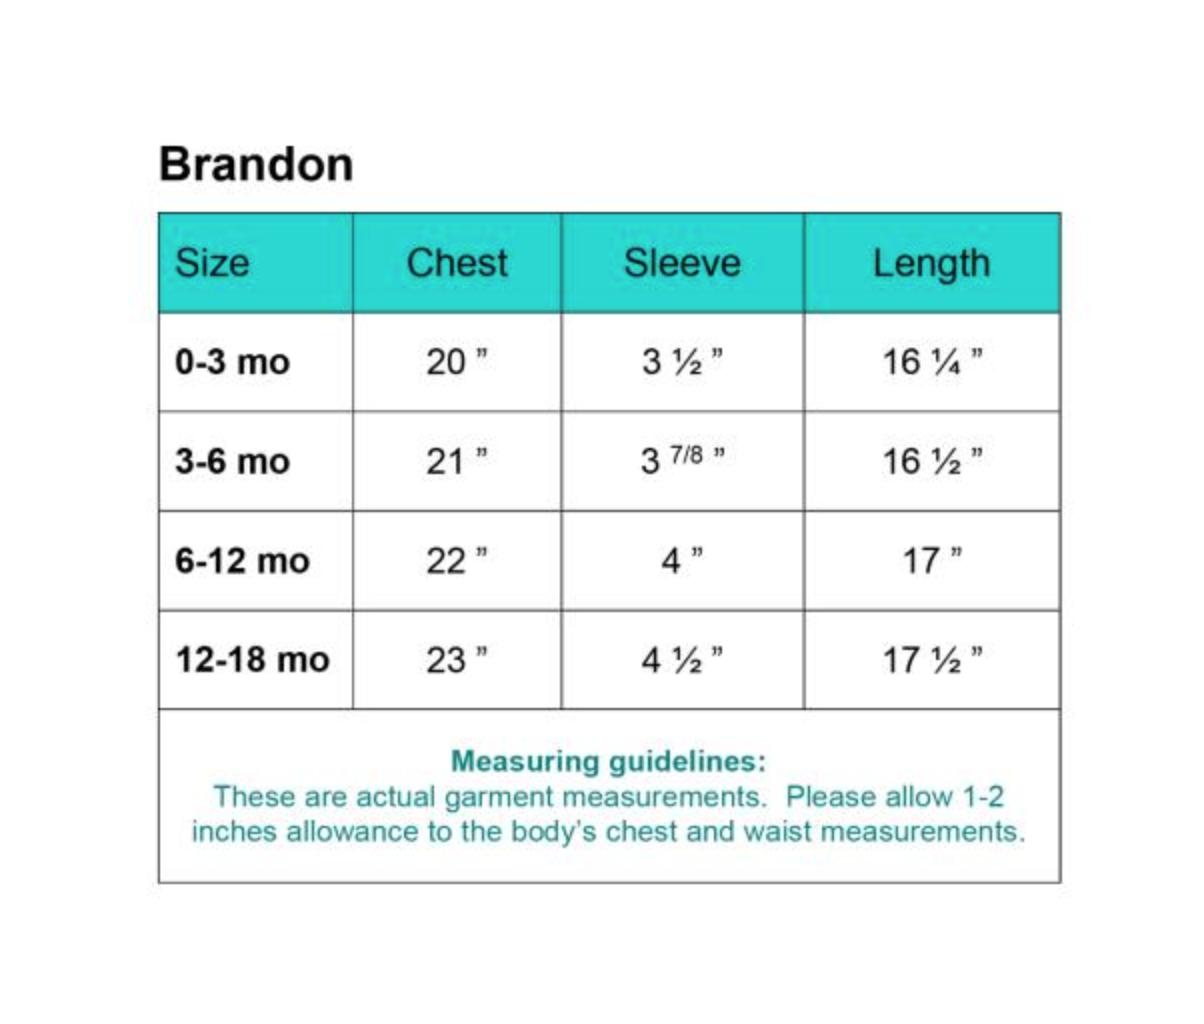 sizing-chart-brandon.png